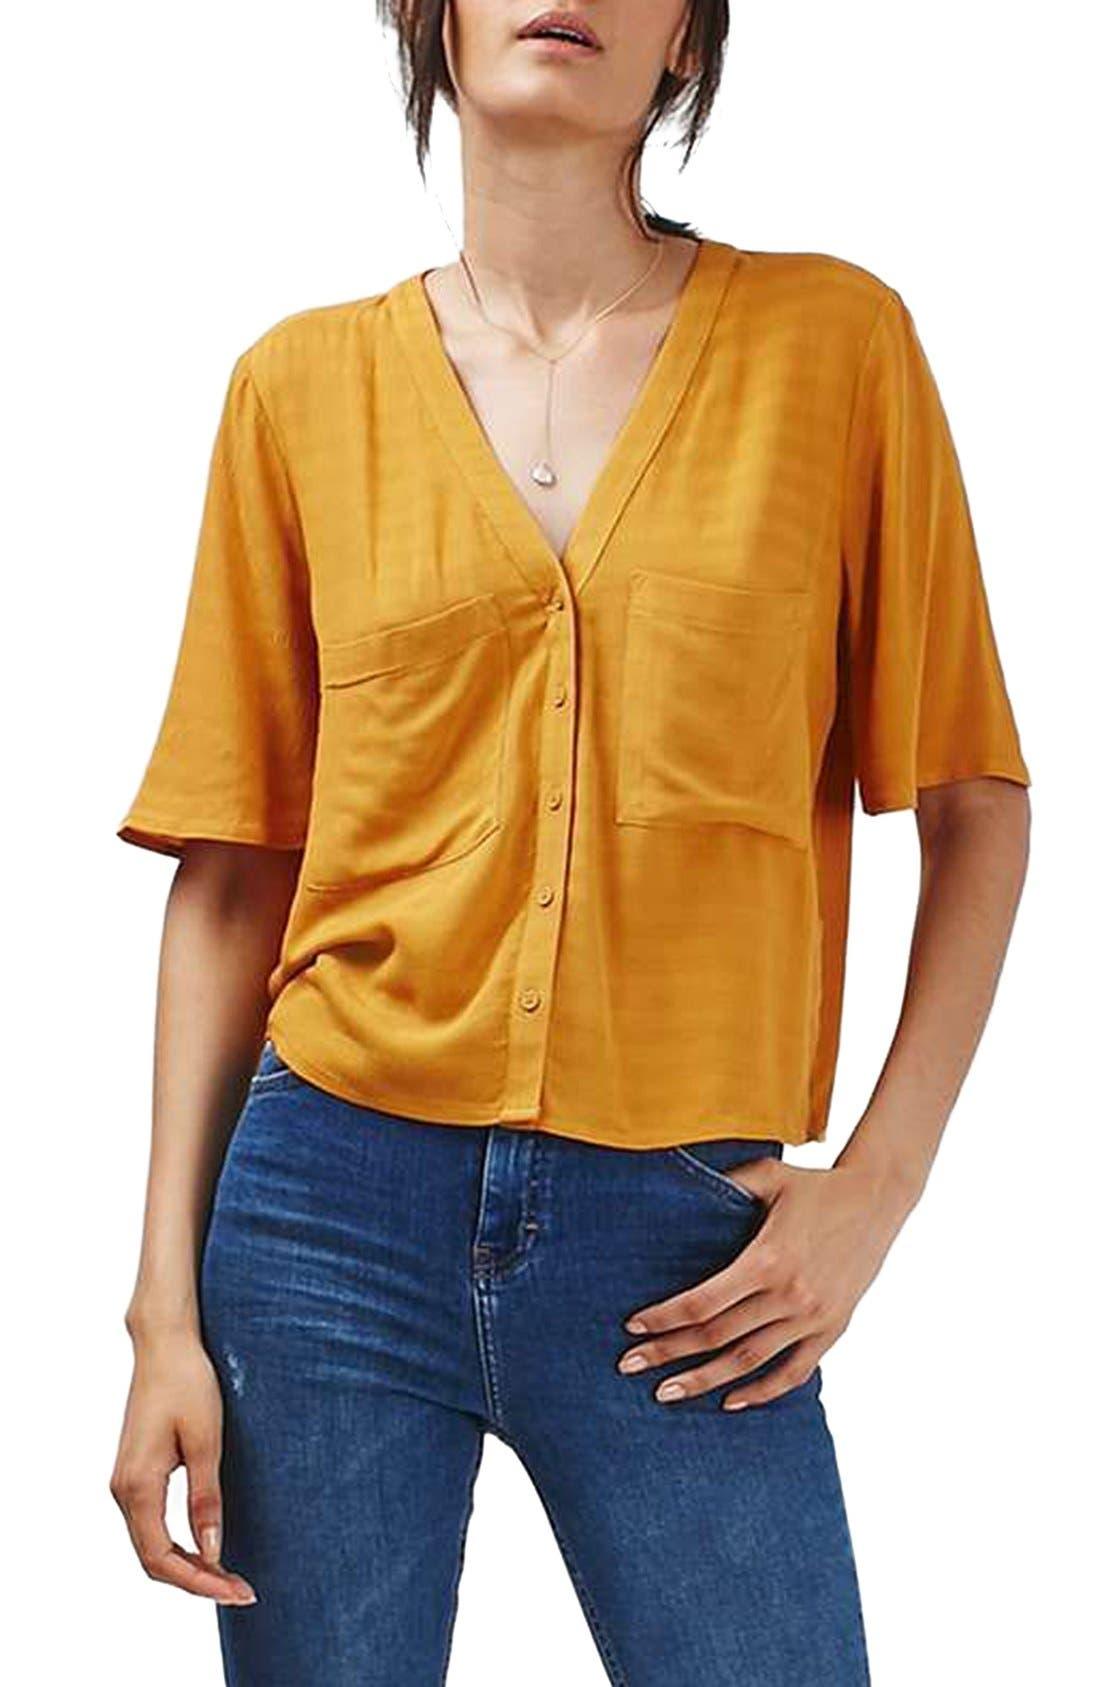 Alternate Image 1 Selected - Topshop 'Holly' Short Sleeve V-Neck Shirt